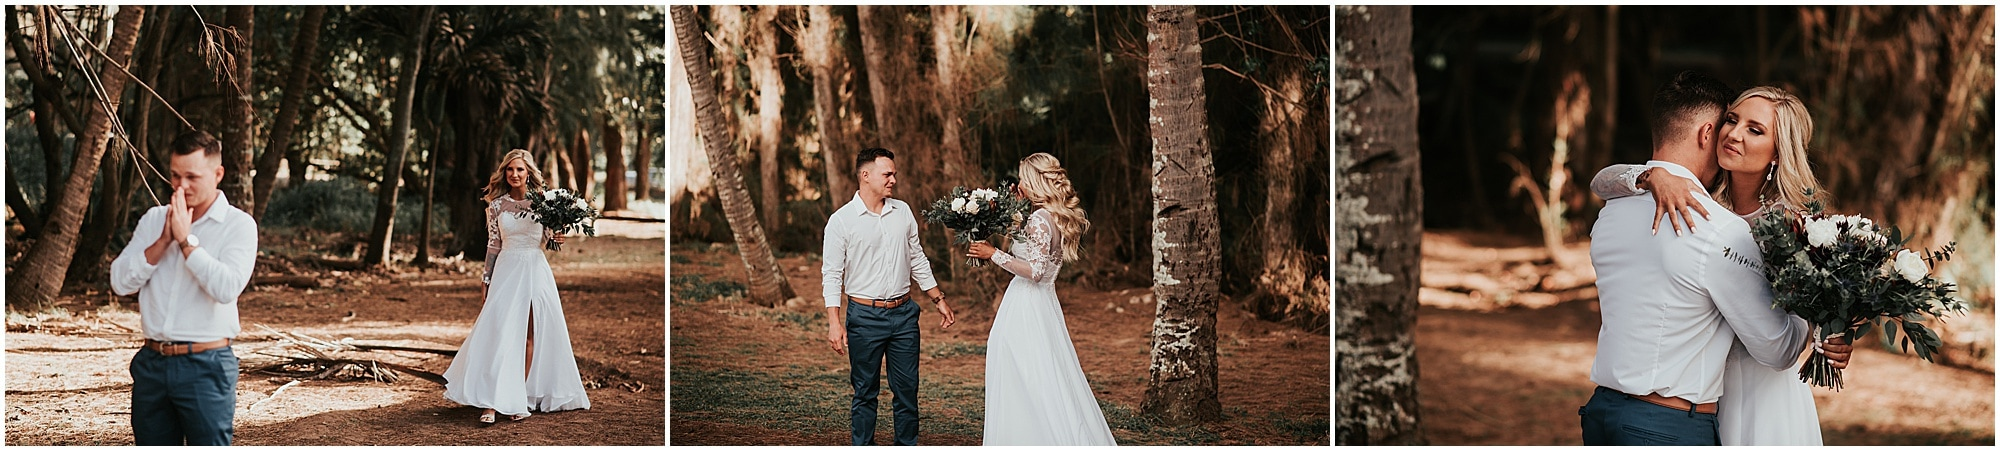 Maui wedding photographer13